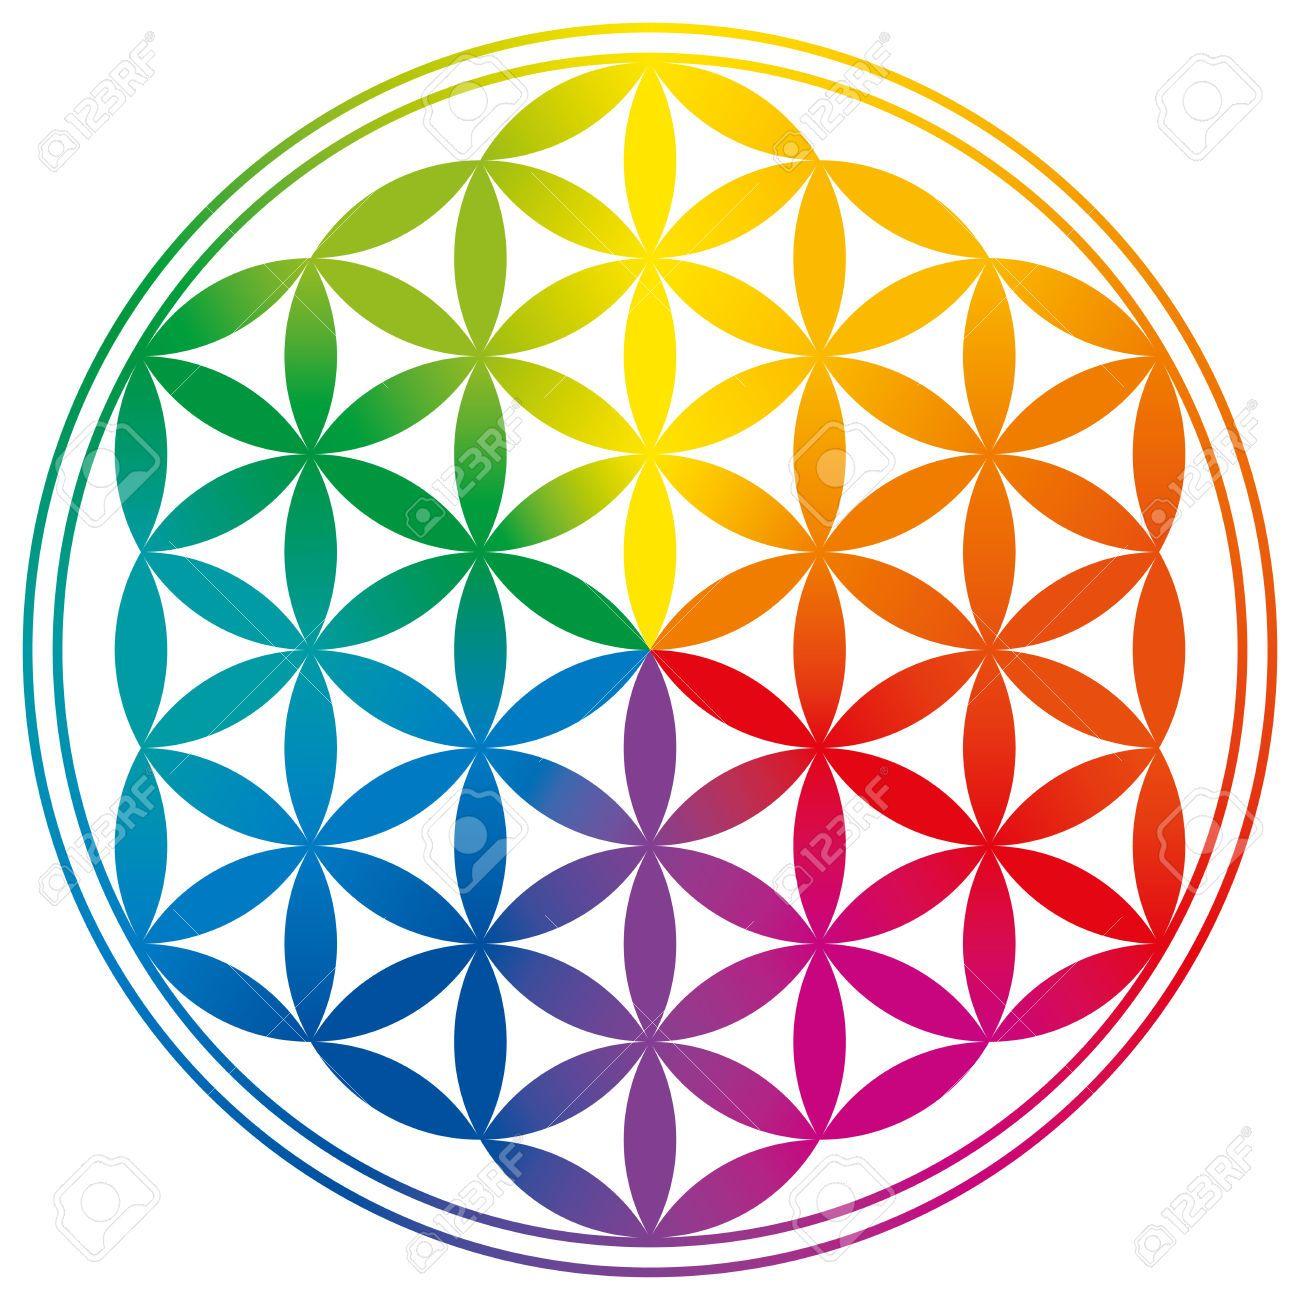 sacred geometry google search map pinterest rh pinterest com Flower of Life Wallpaper Anime Yin and Yang